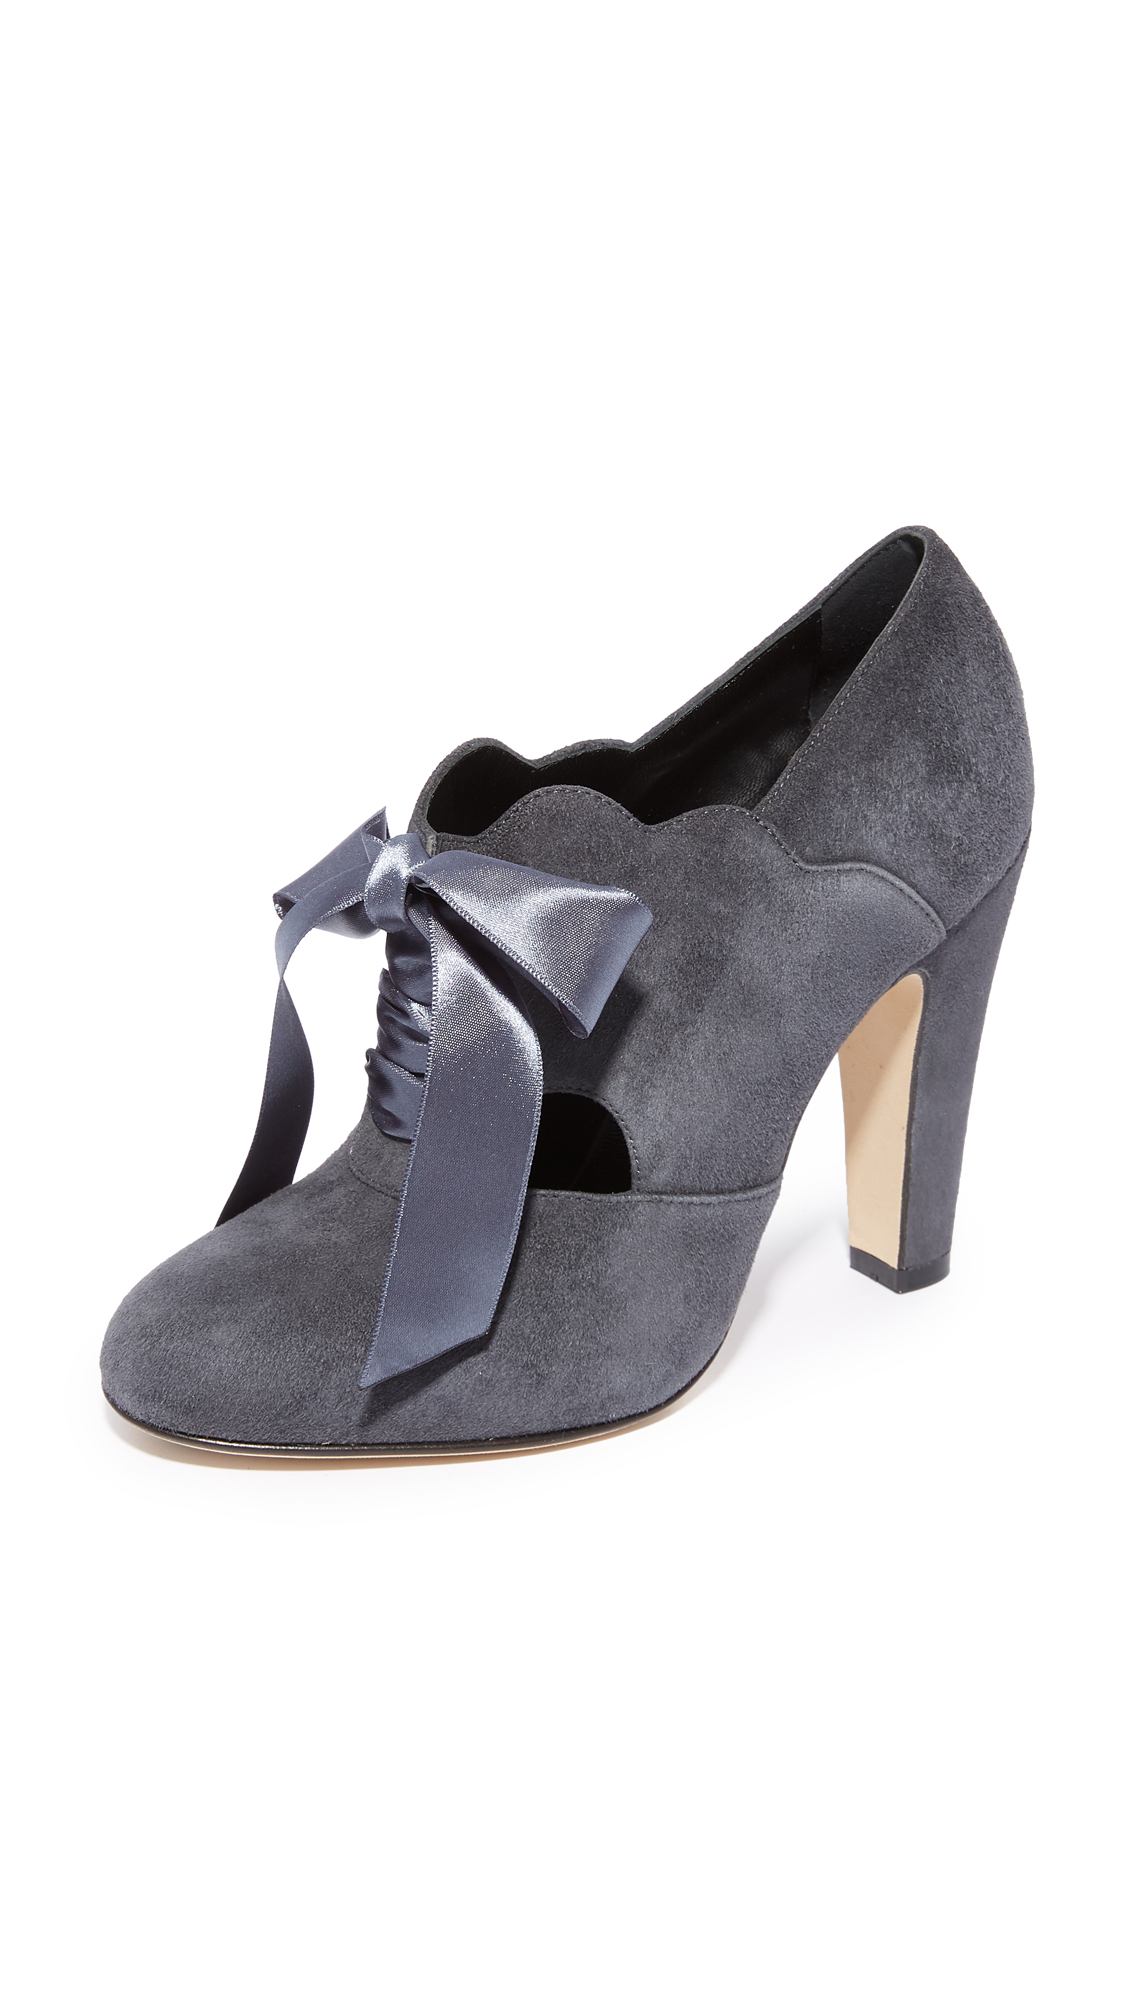 Sarah Flint Mosha Heels - Slate